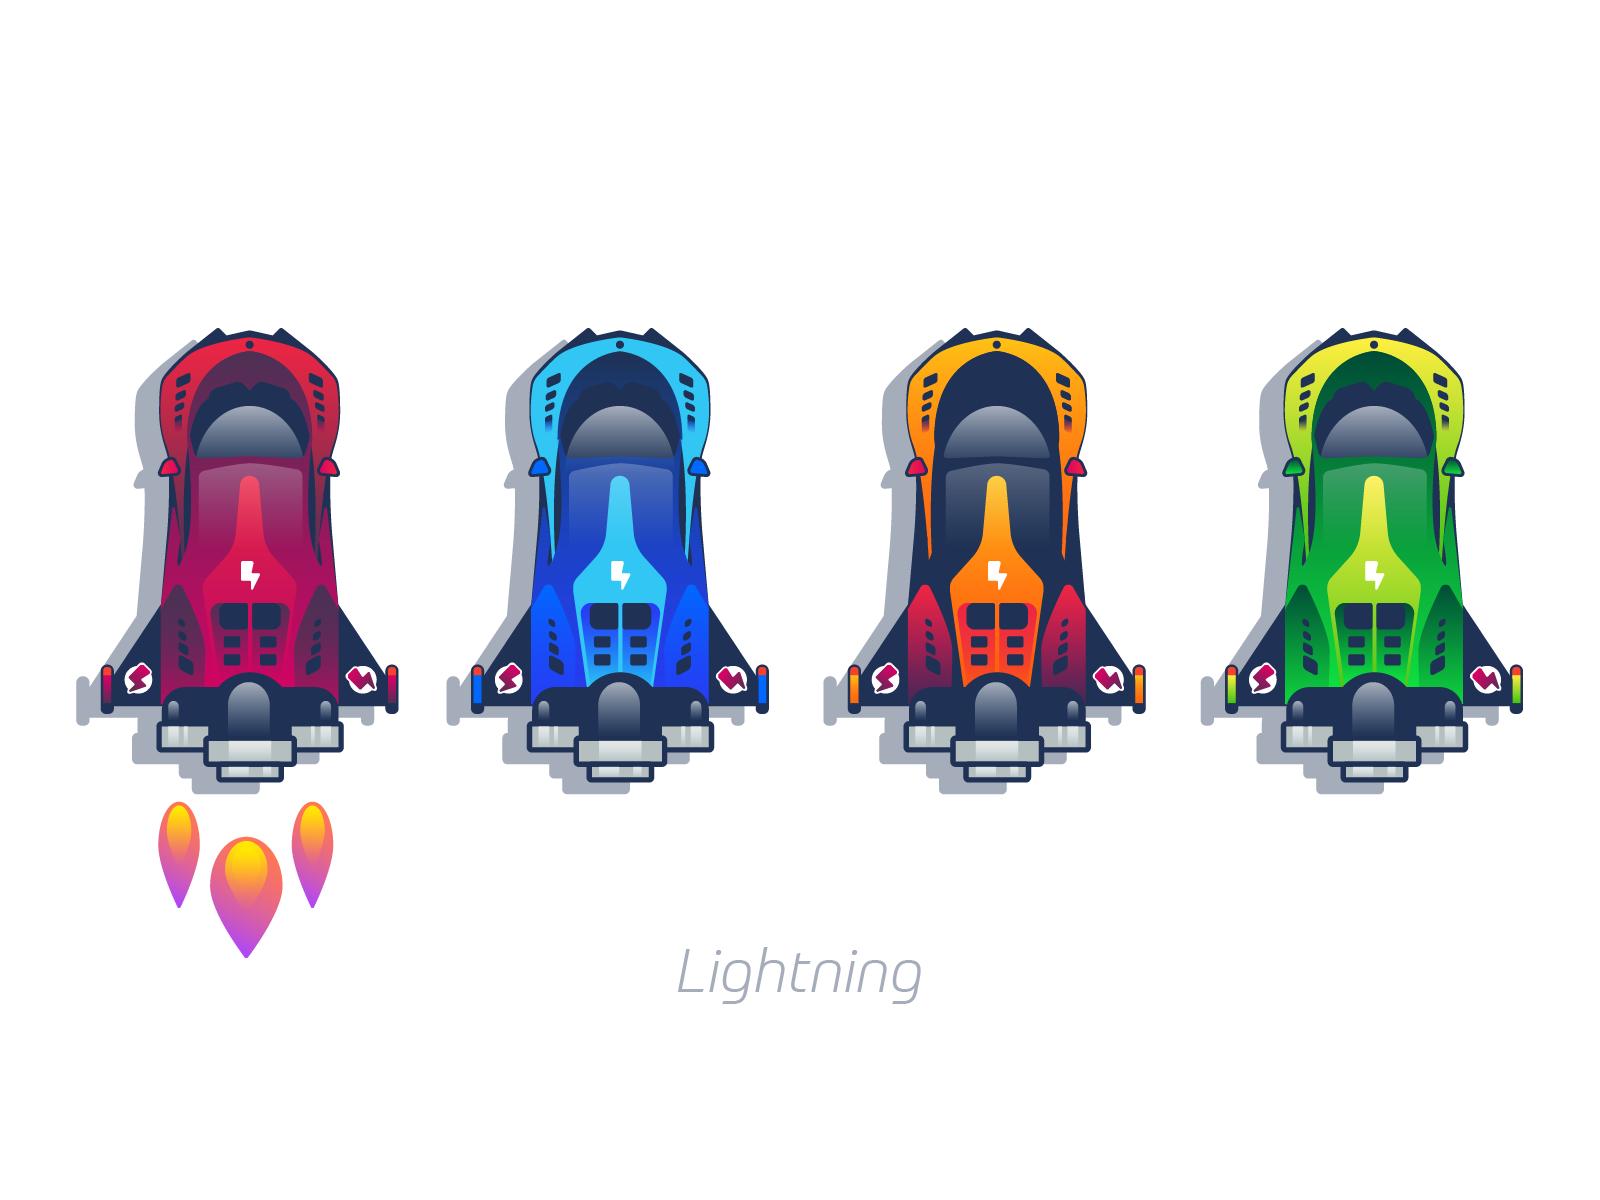 Lightning cars graphic design illustration